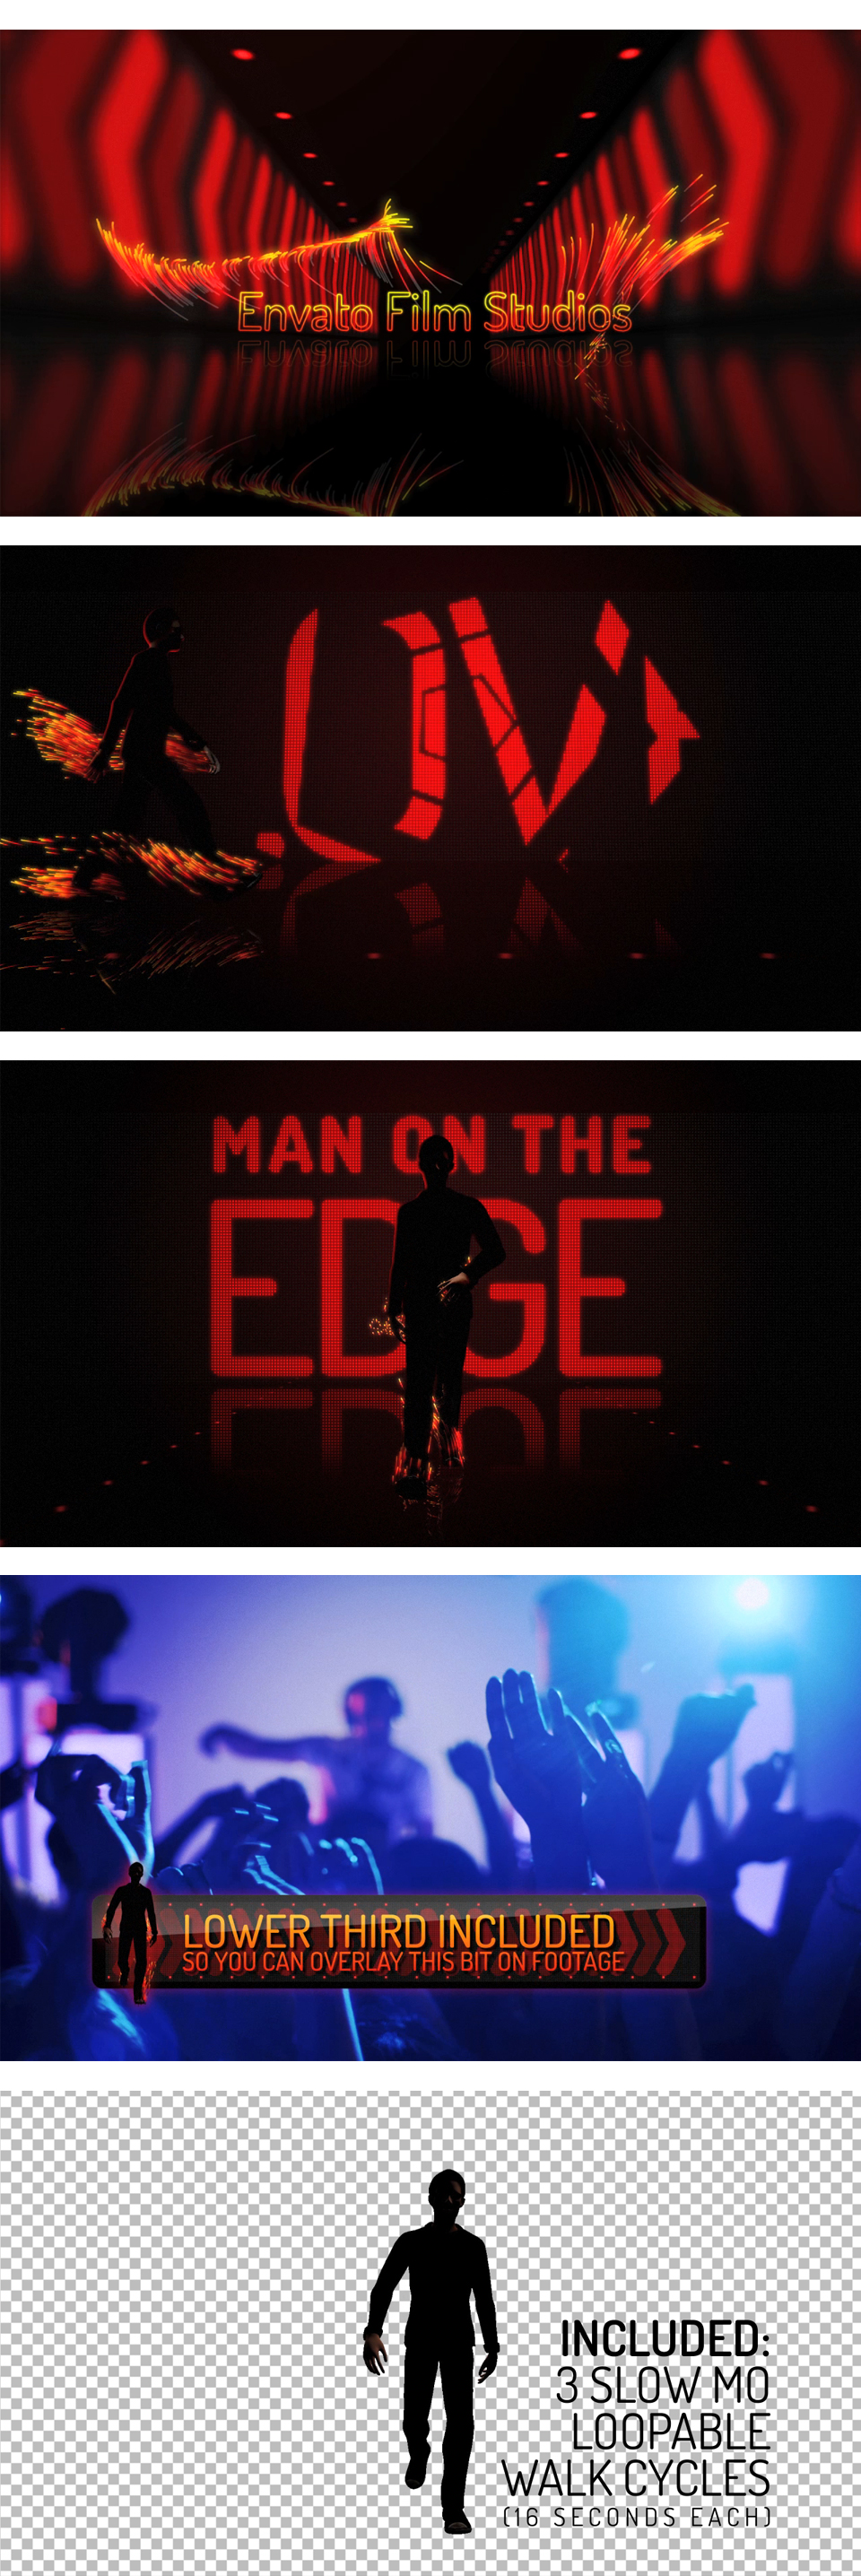 Intense Action Trailer - Man On The Edge - 1